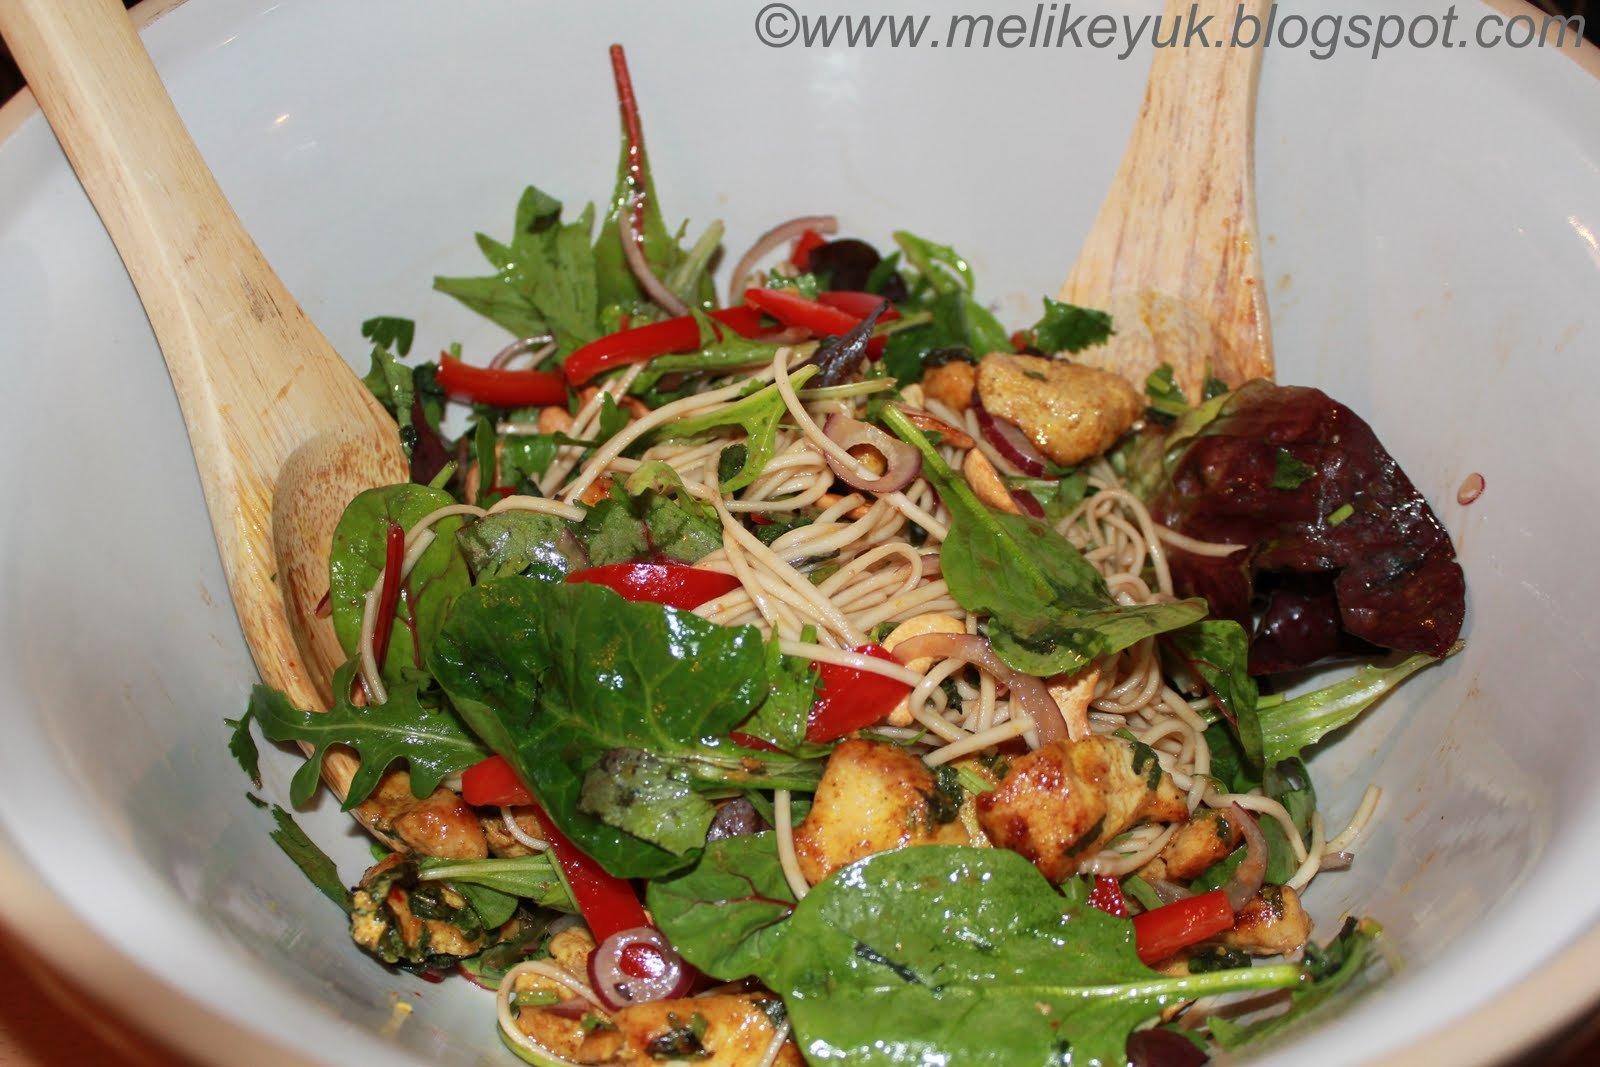 Spicy Chicken Salad with Coriander, Mint & Noodles